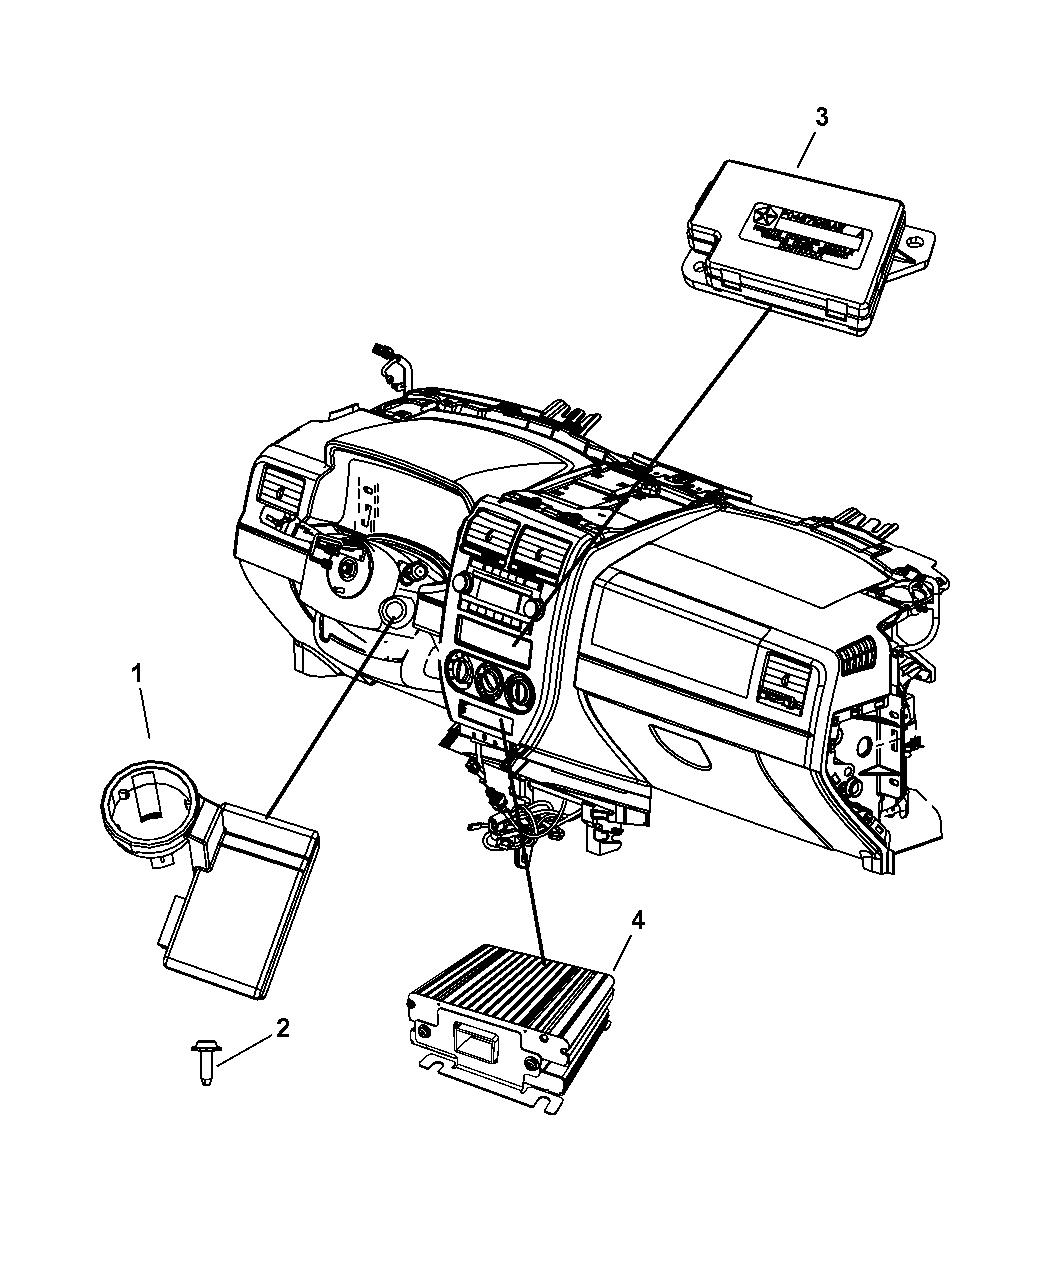 2015 Jeep Compass Modules Instrument Panel Mopar Parts Giant Wiring Diagram